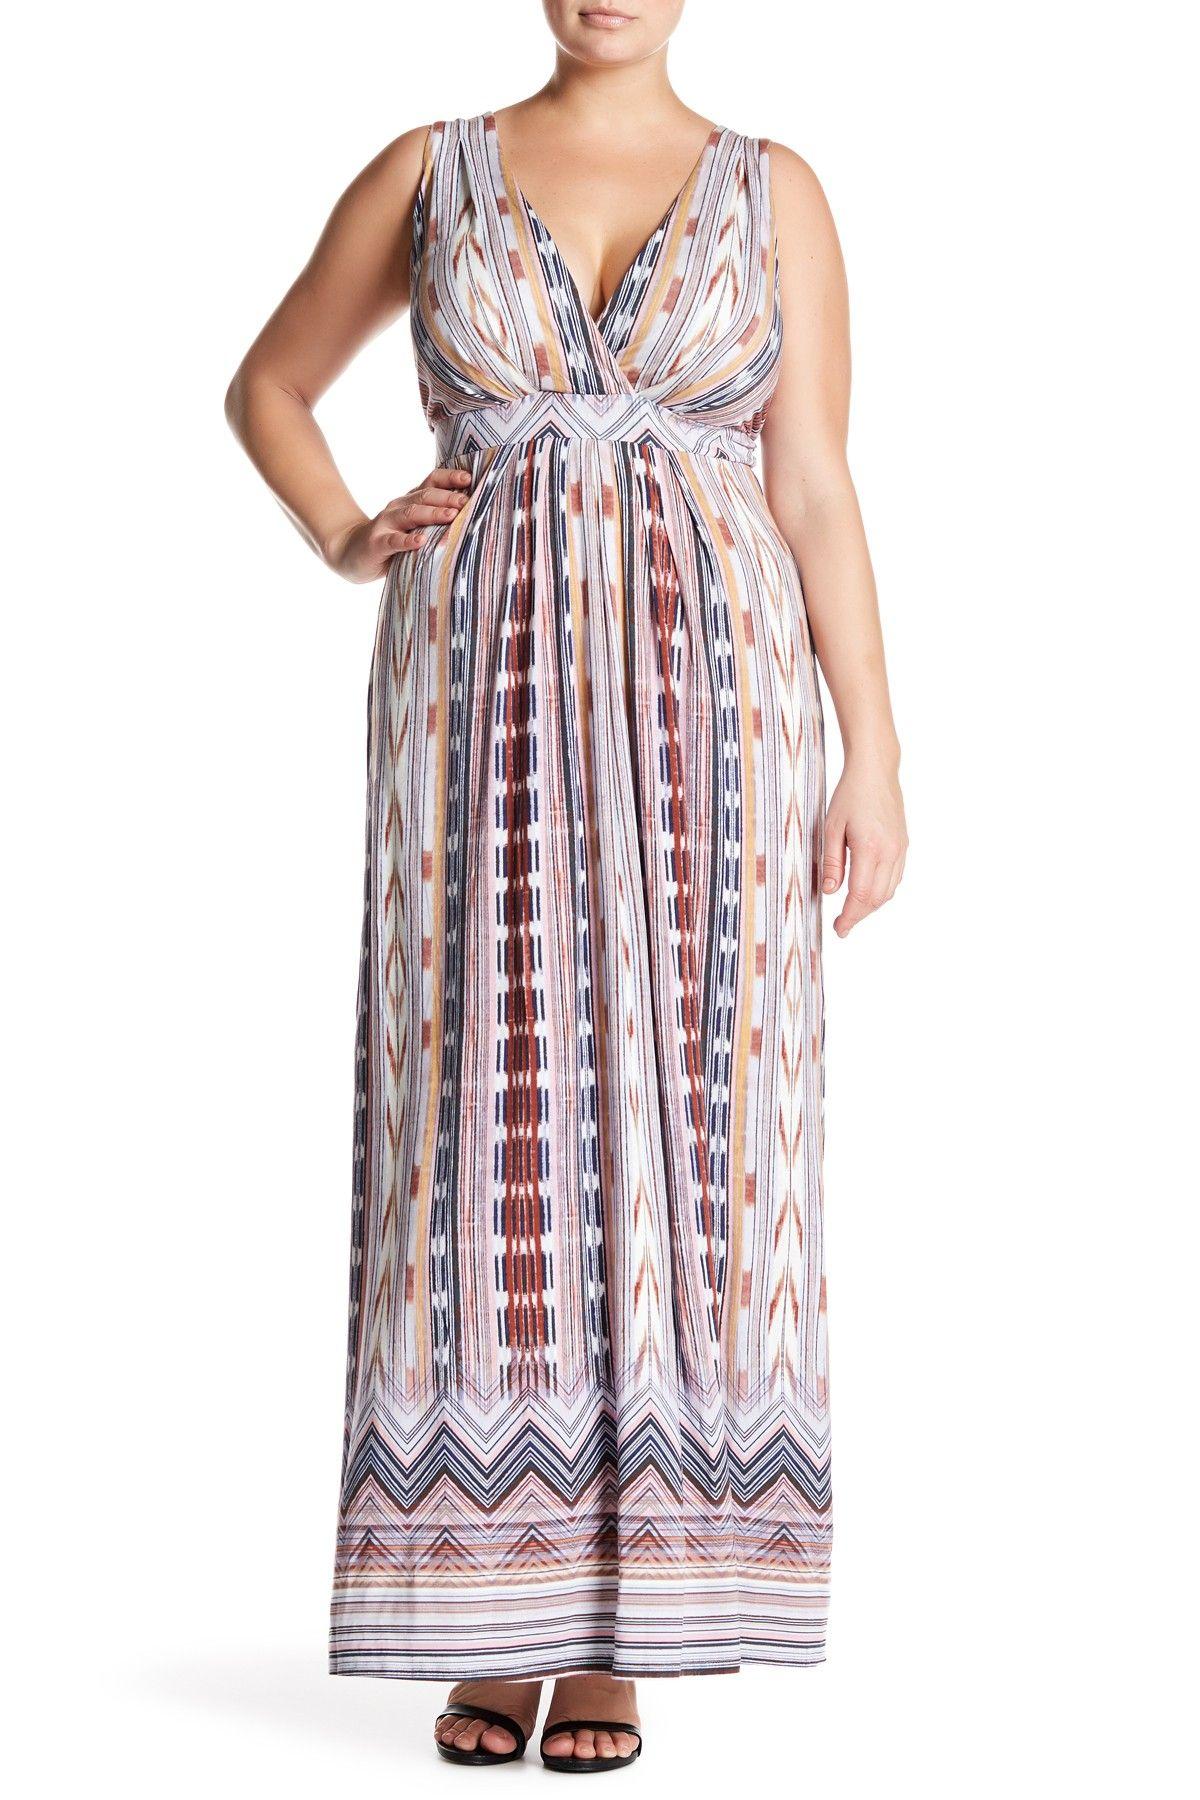 Plus Size Maxi Dresses Nordstrom Rack